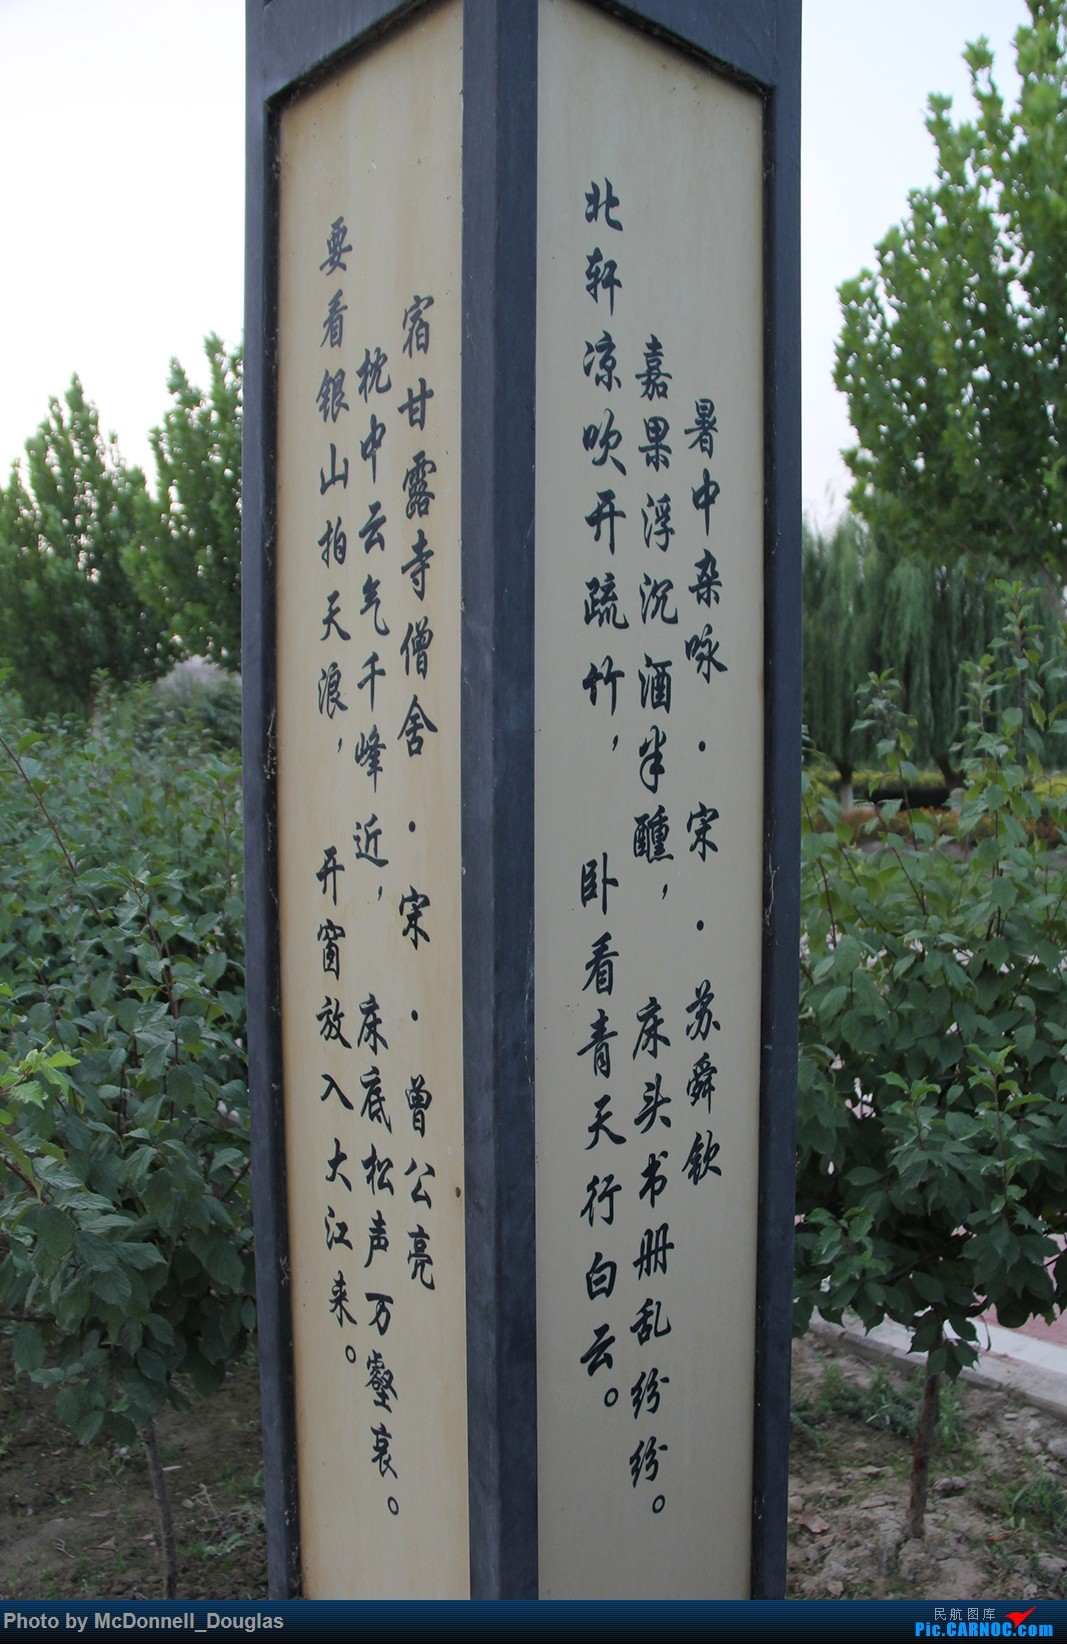 Re:[原创]【上海飞友会】【zc带你走天下(2)】再访祖辈年轻时工作的土地,父母年少时生活戈壁,跨越大半个中国去看新疆,回程小游蓉城(上)